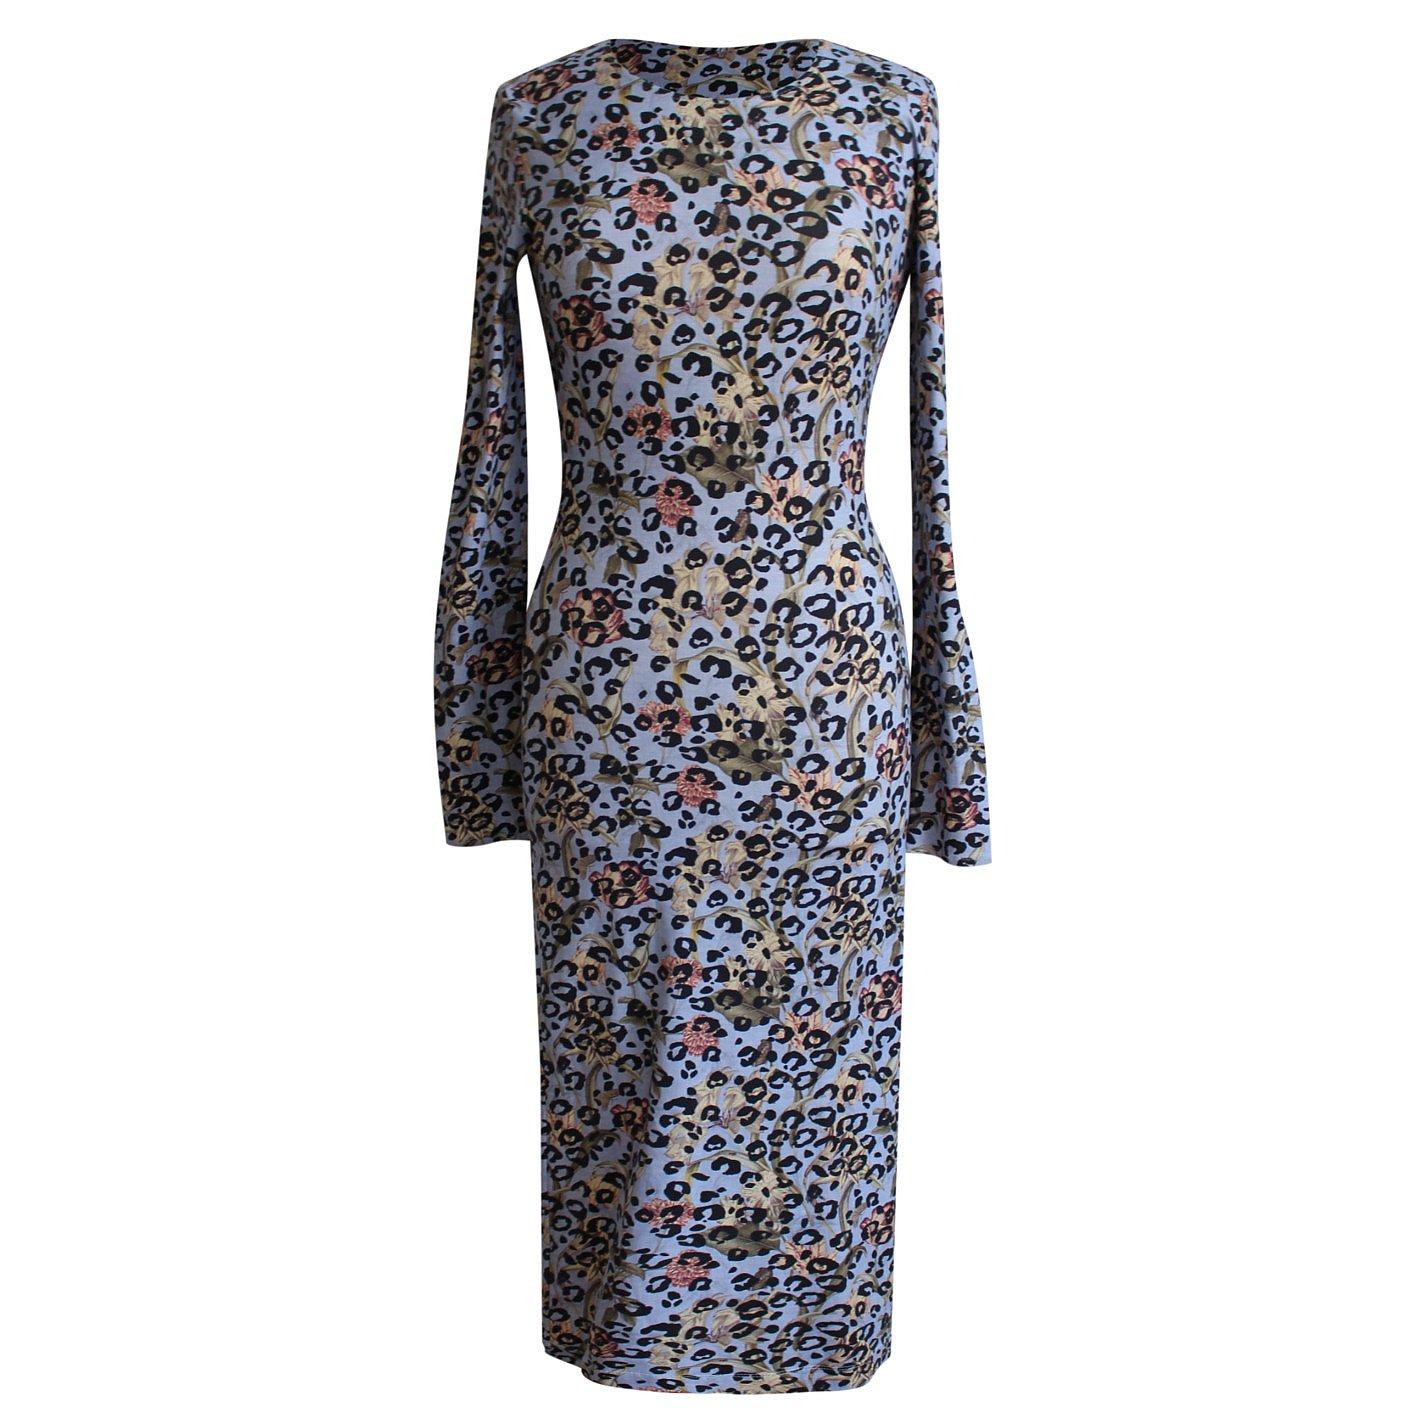 Thornton Bregazzi Thornton Bregazzi Long Sleeved Maxi Dress